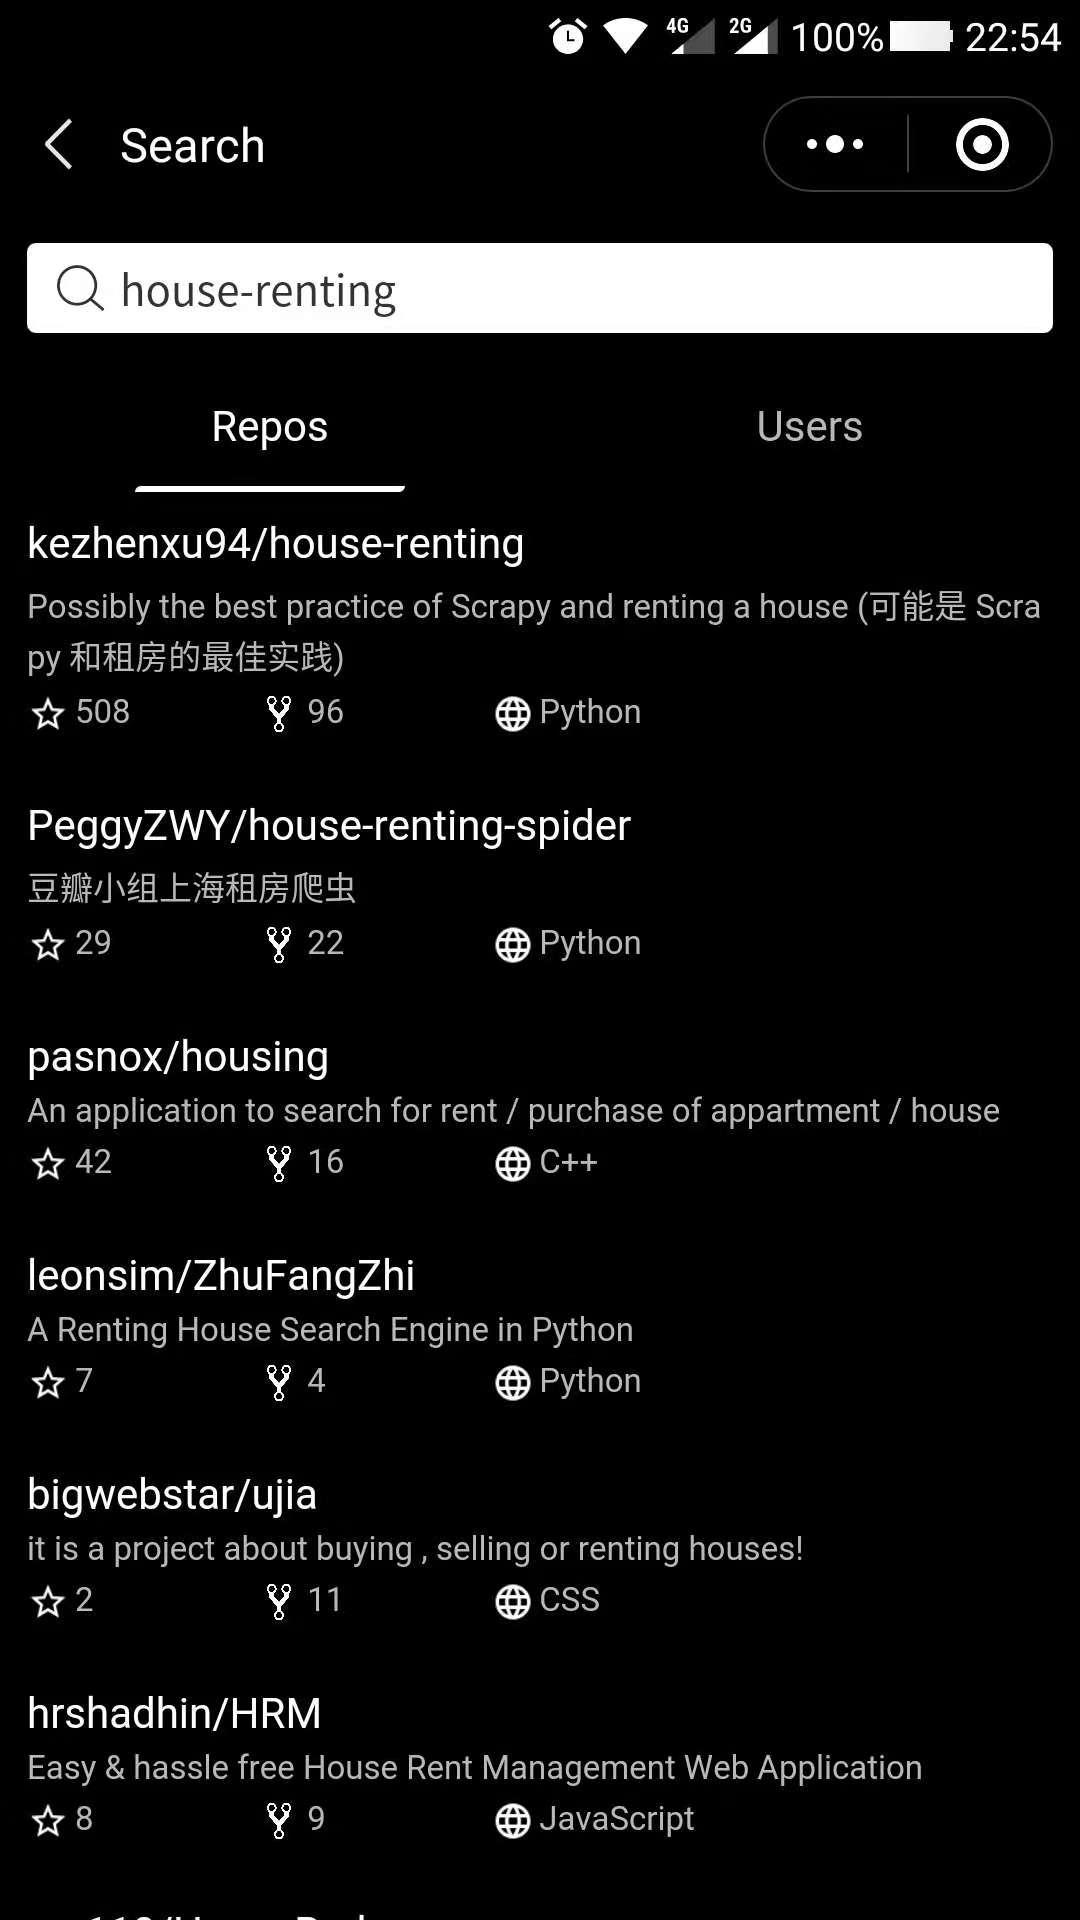 search-repos